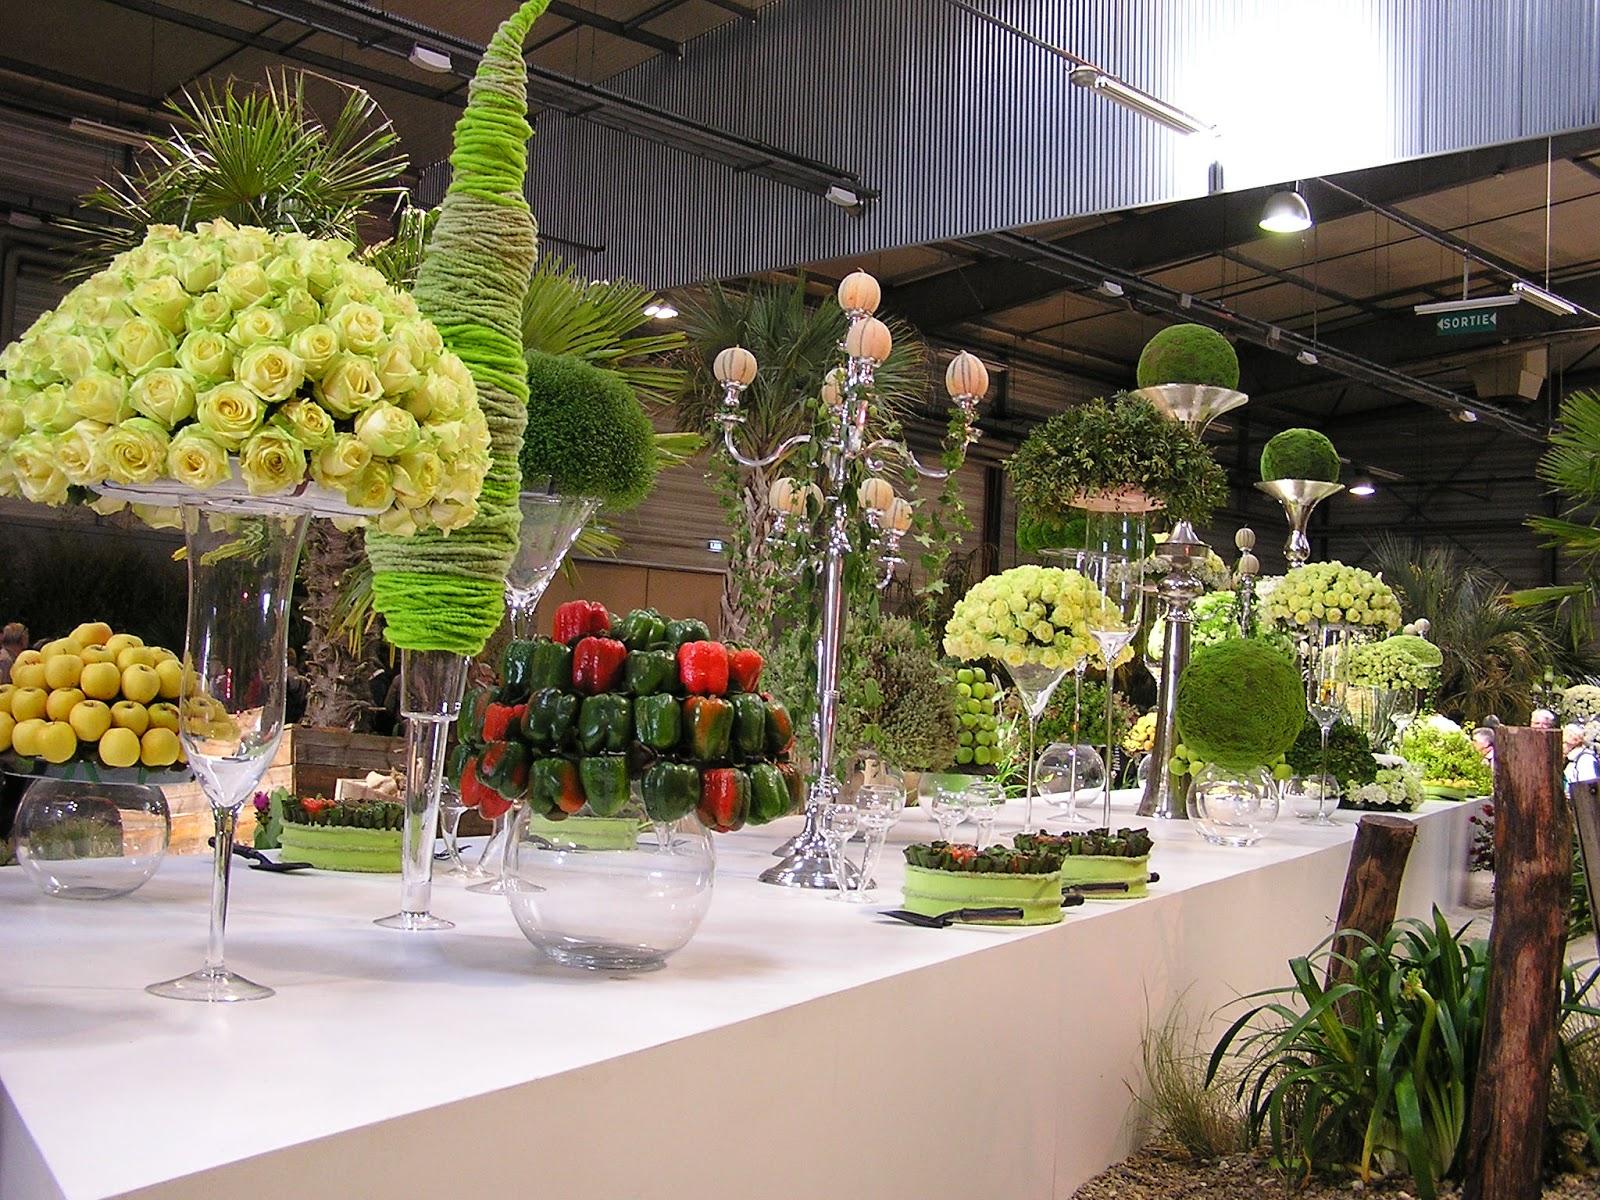 Un petit coin de paradis en bri re floralies nantes 2014 for Jardin de jardiniers